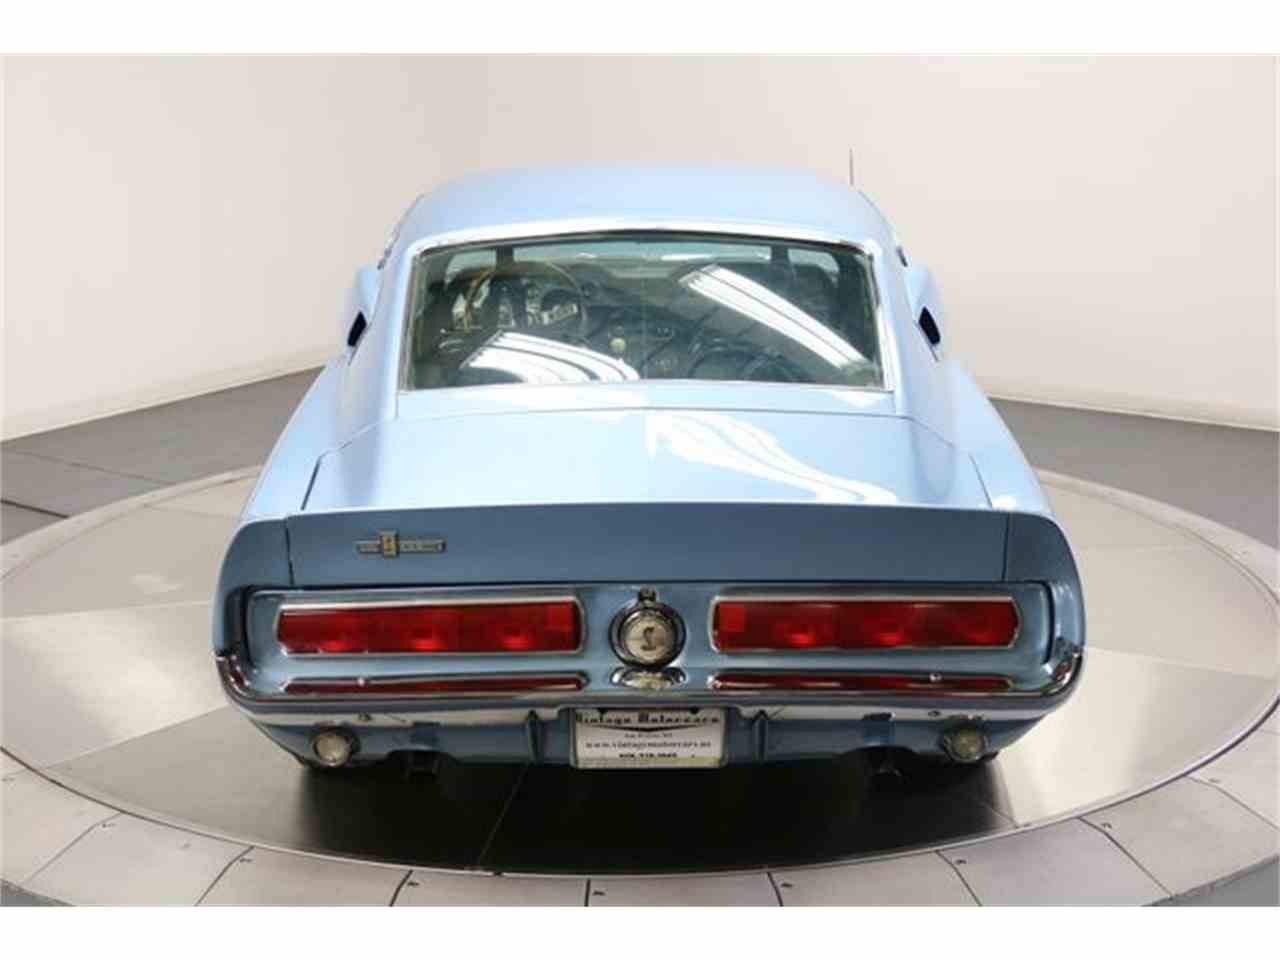 Tags:Vehicles For Sale In Waukesha WI Russ Darrow Kia Of,Kia Dealer Waukesha  WI New Amp Used Cars For Sale Near,Russ Darrow Kia Kia Dealer Madison  Wauwatosa ...